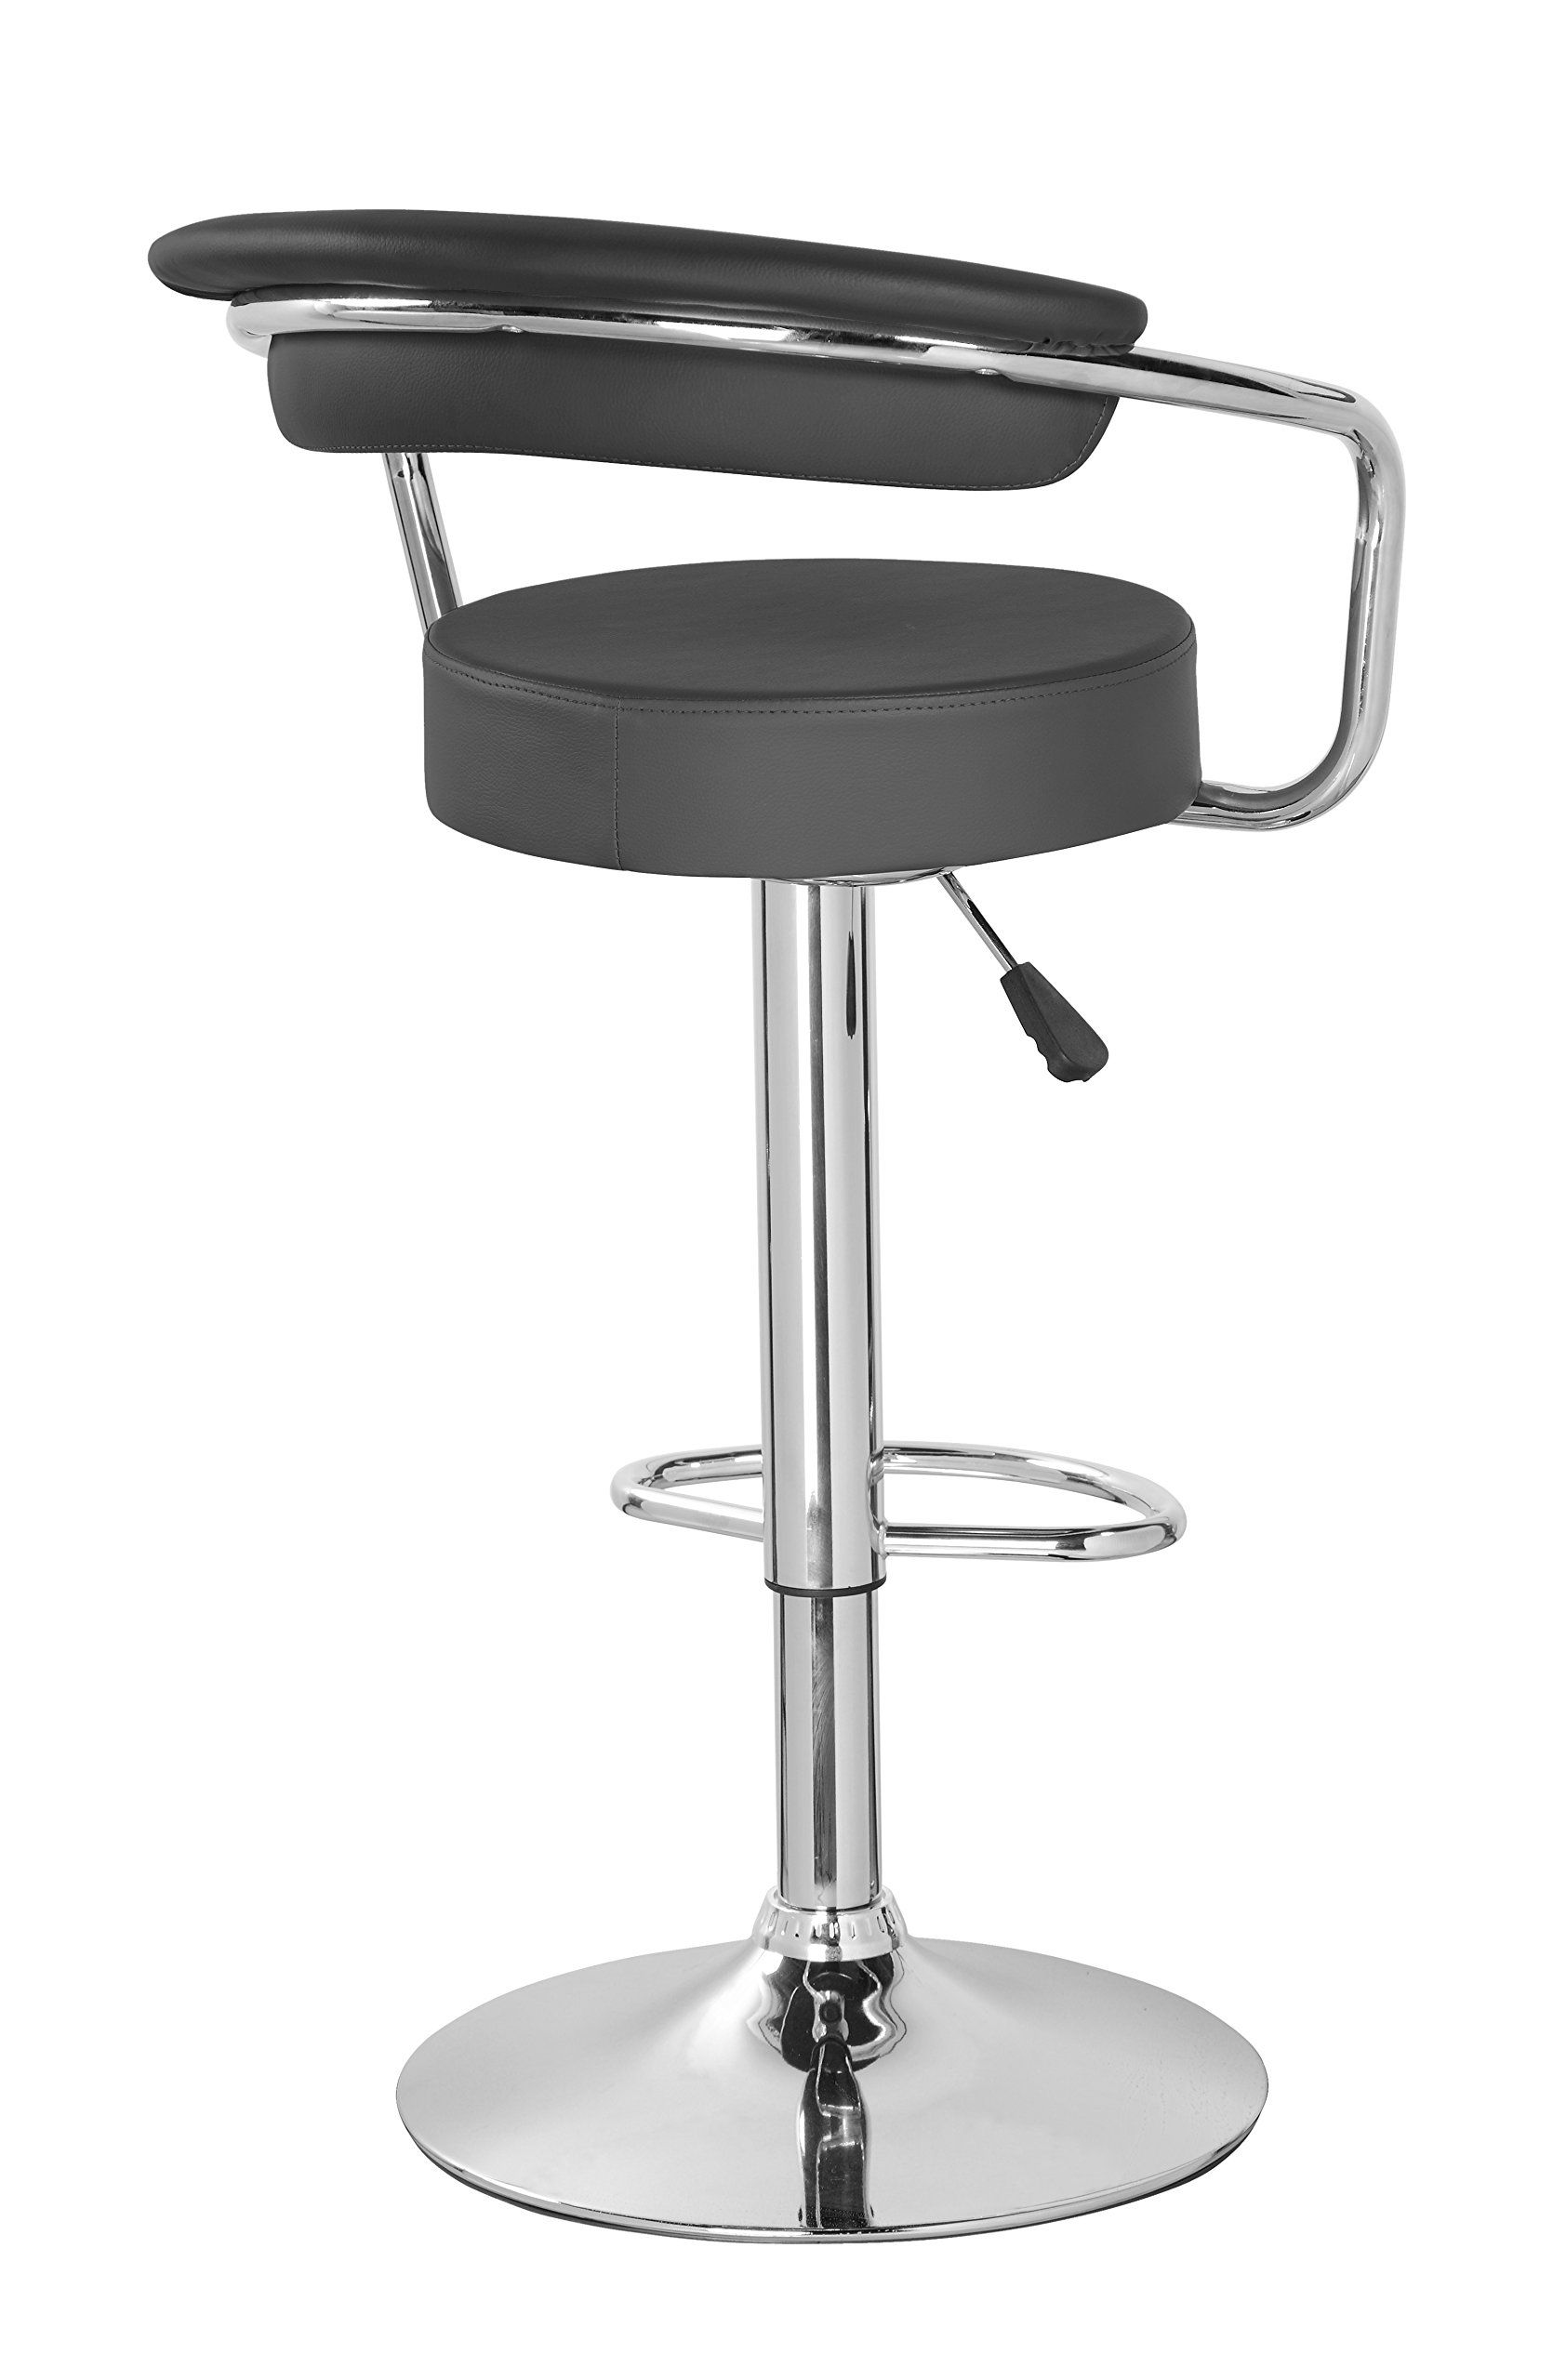 Kerland pu leather swivel adjustable seat height home